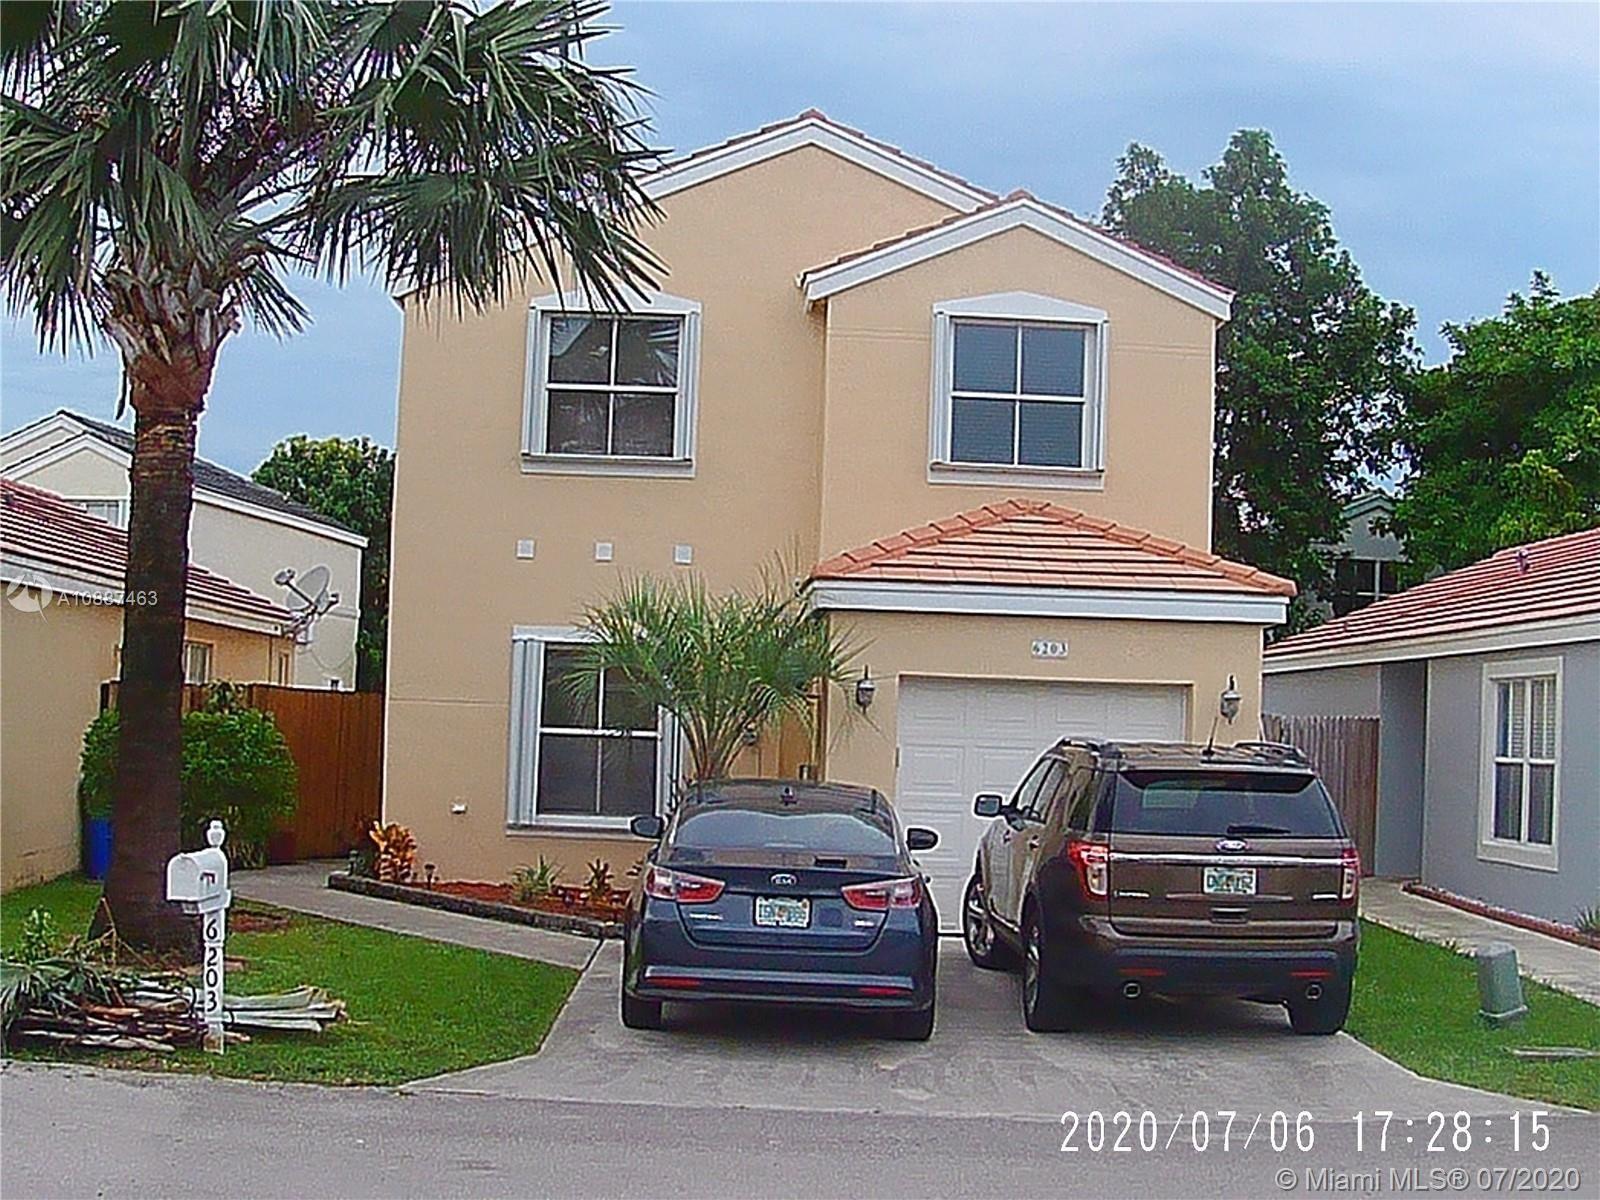 6203 Buena Vista Dr, Margate, FL 33063 - #: A10887463